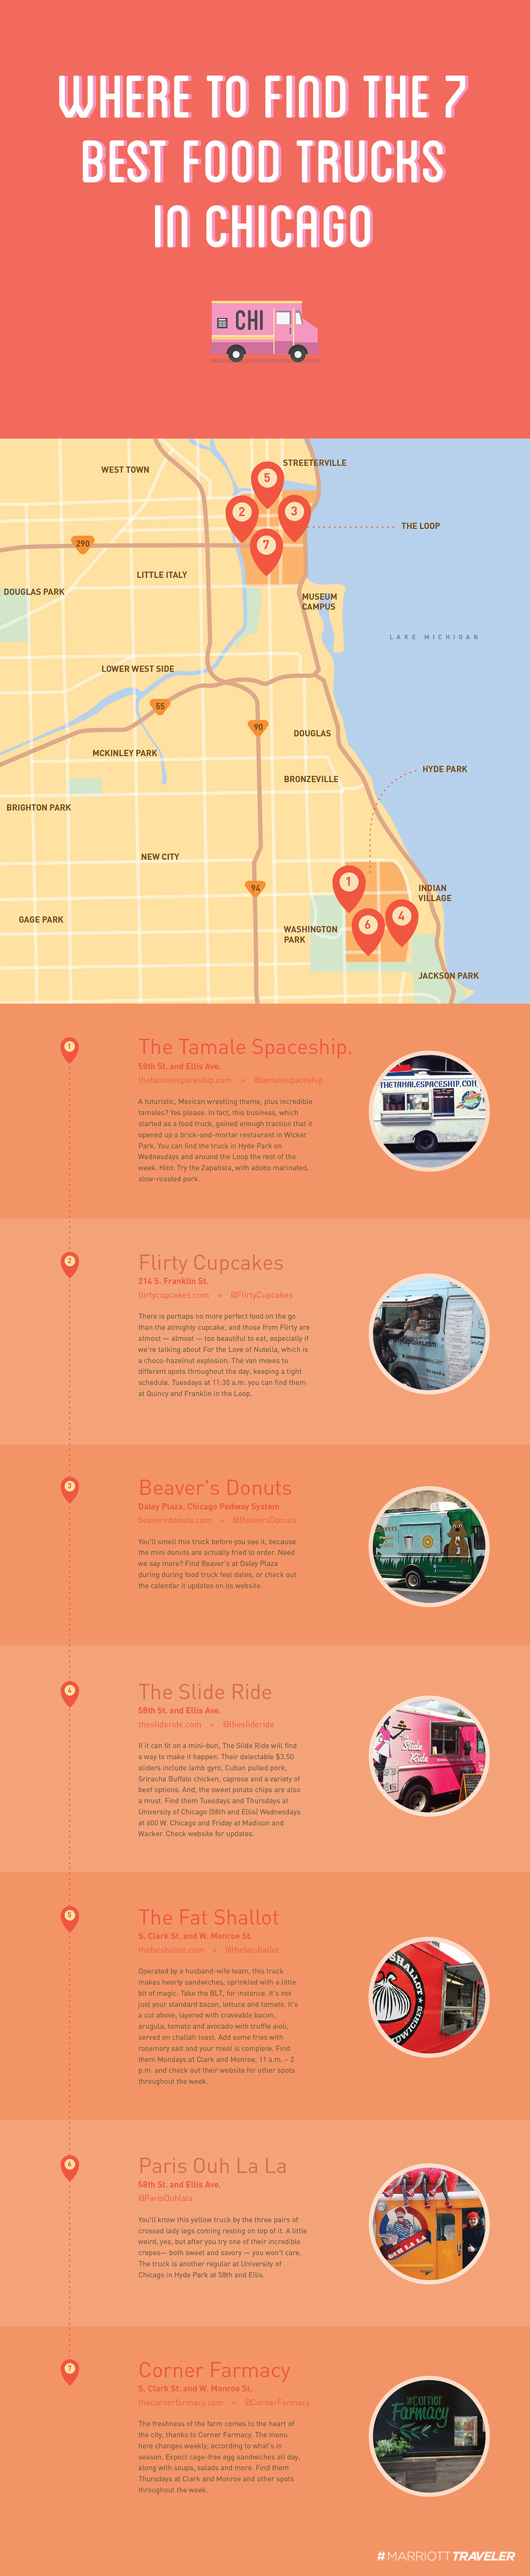 best-food-trucks-chicago-infographic-main.jpg